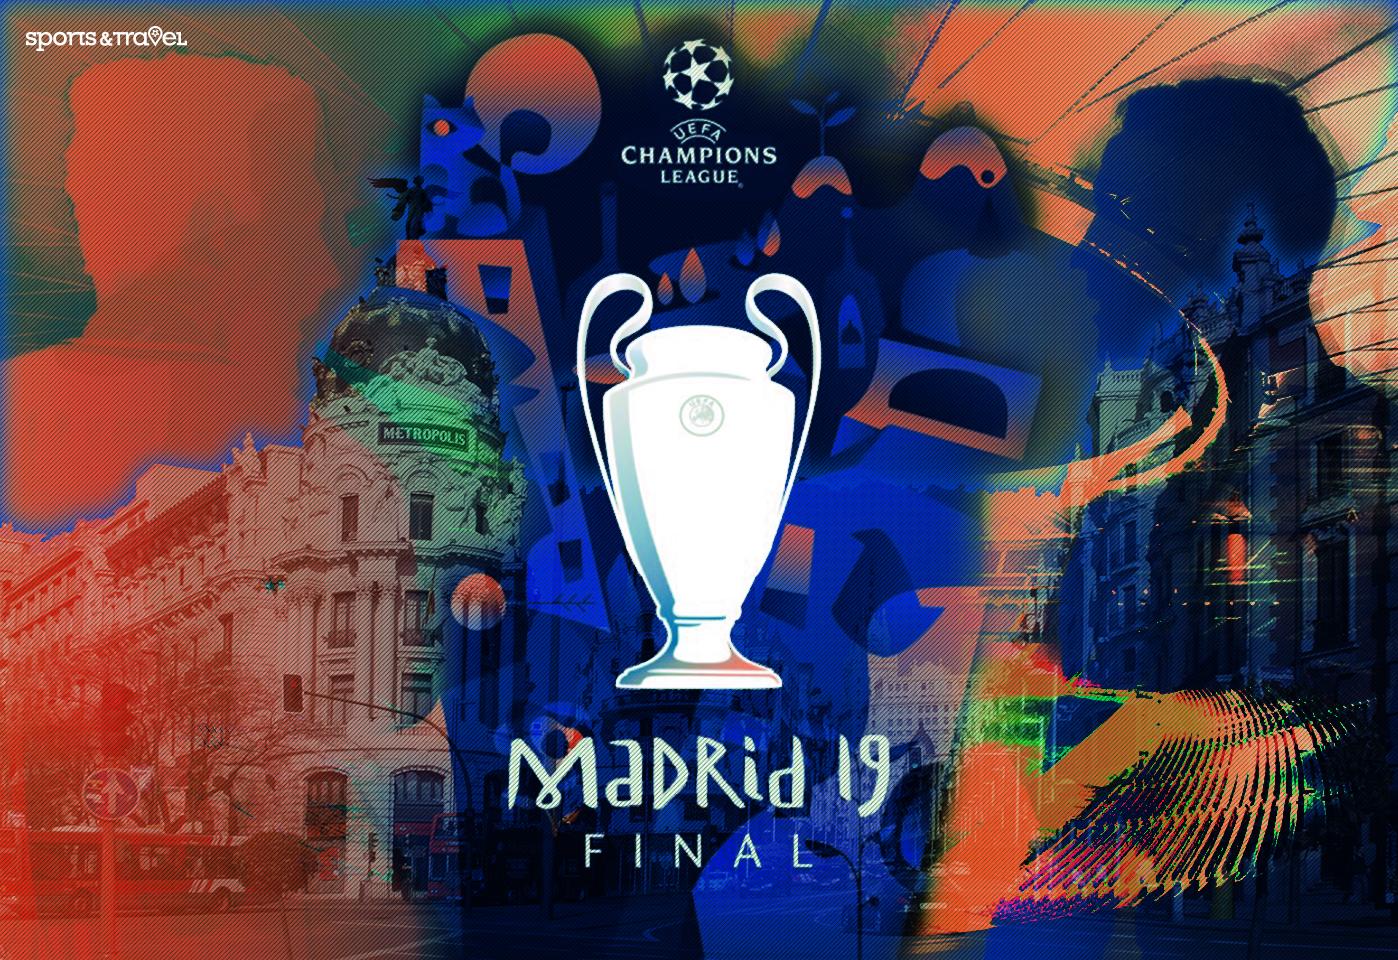 UEFA Champions League Final 2019